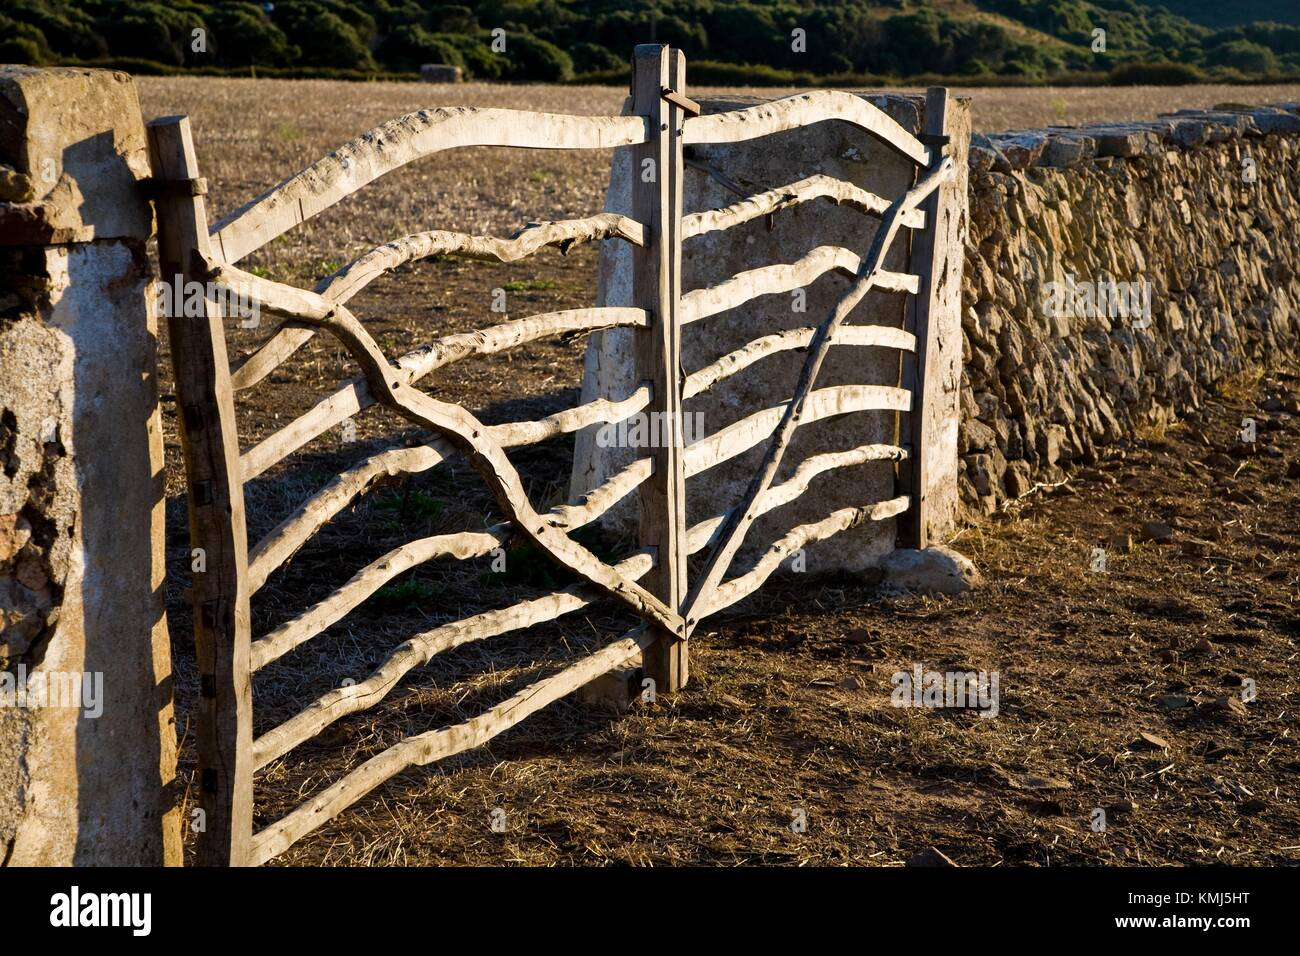 Cami d´en Kane. Menorca. Balearic Islands. Spain. - Stock Image